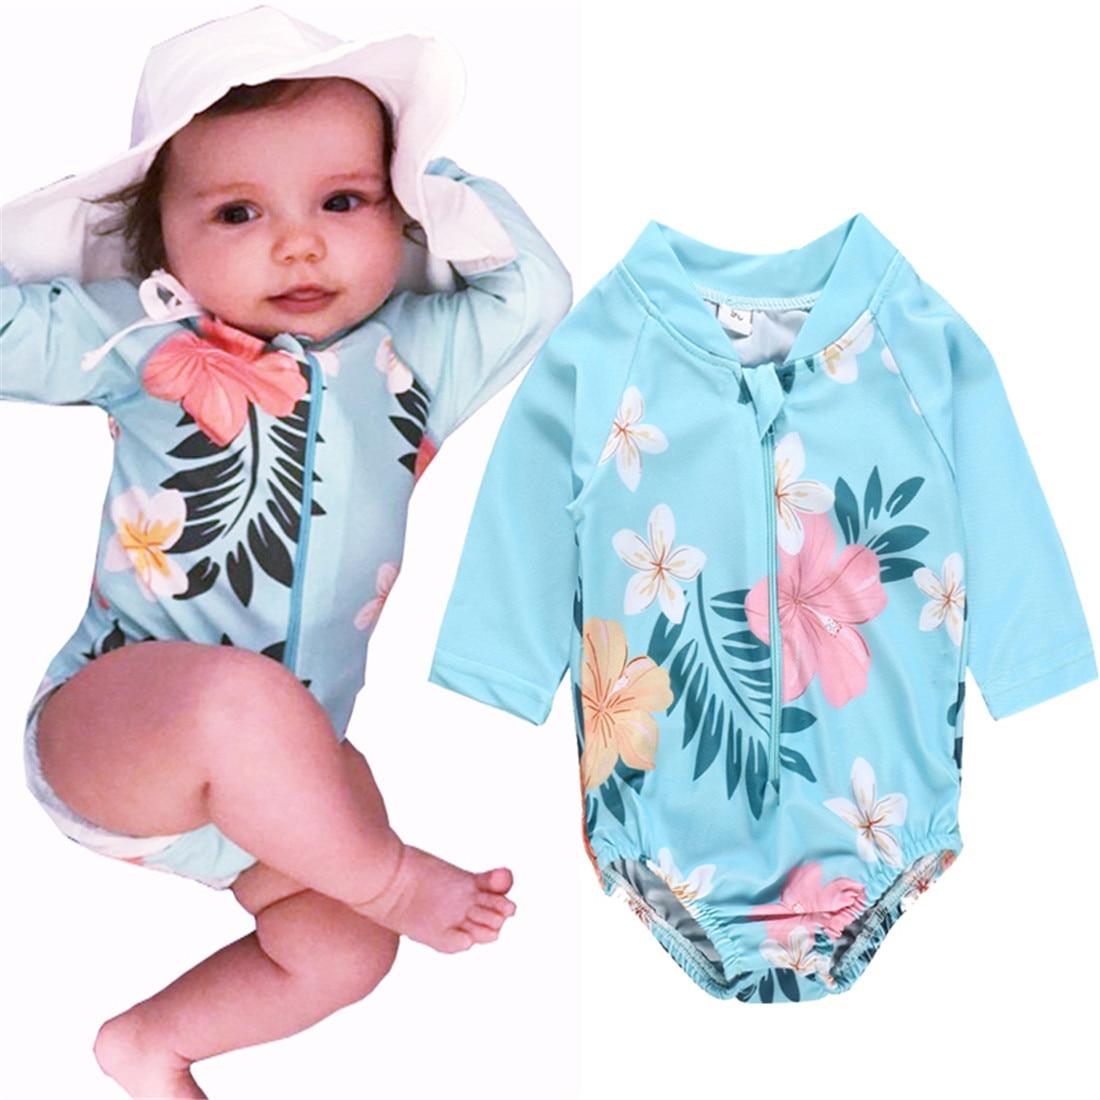 0-3T niño chico bebé niña verano manga larga Floral cremallera traje de baño azul traje de baño